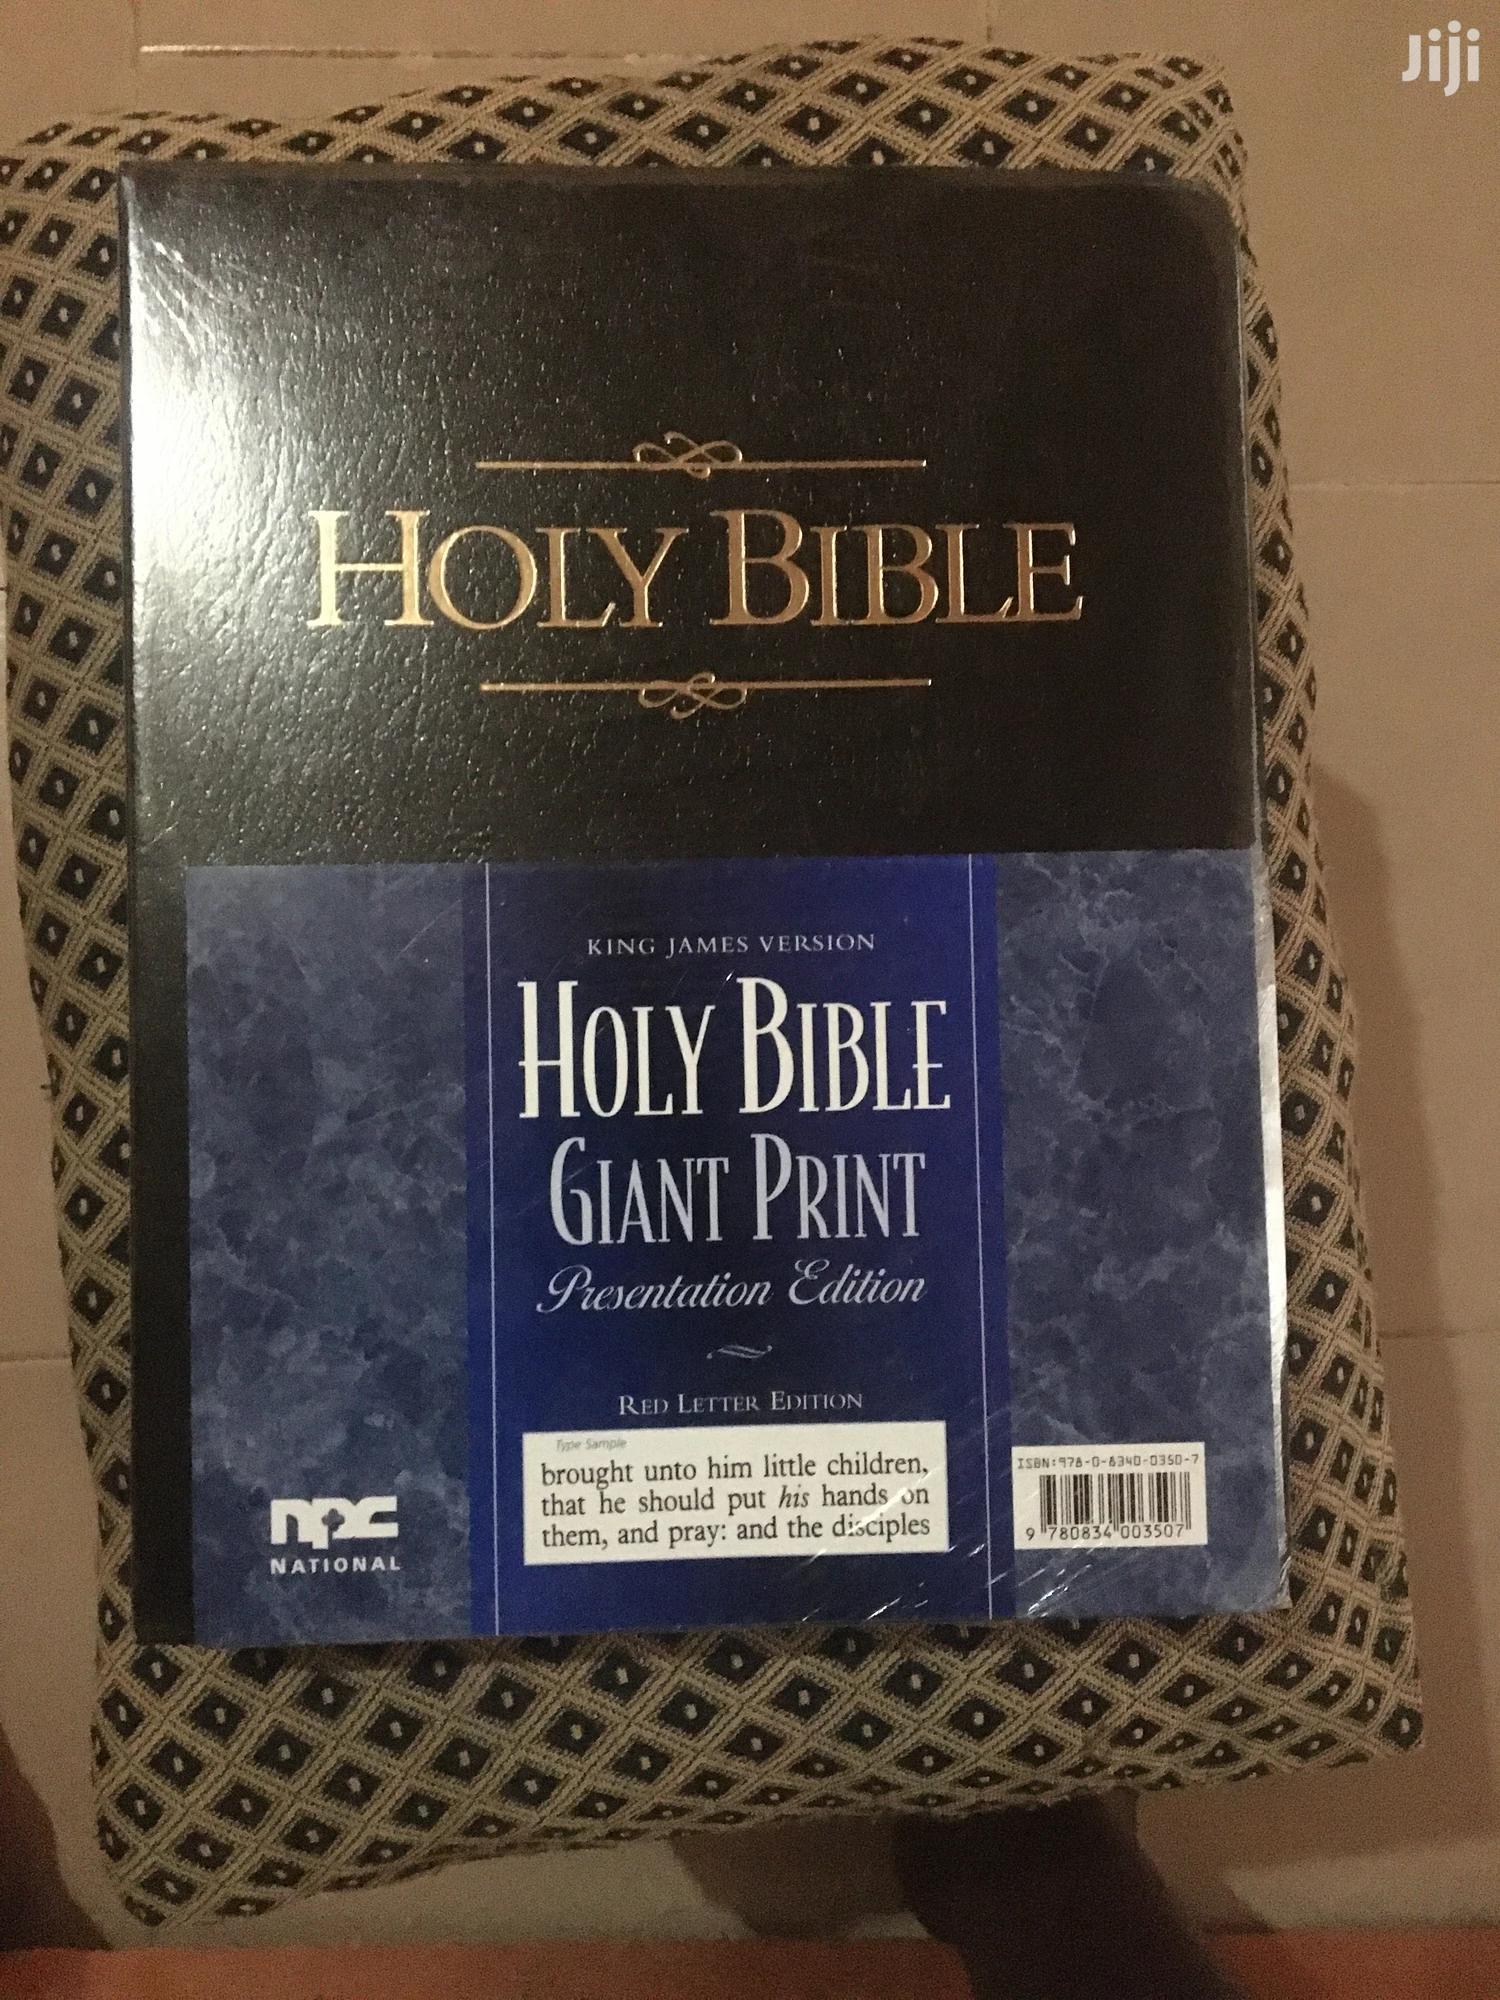 Holy Bible, Giant Print JKV